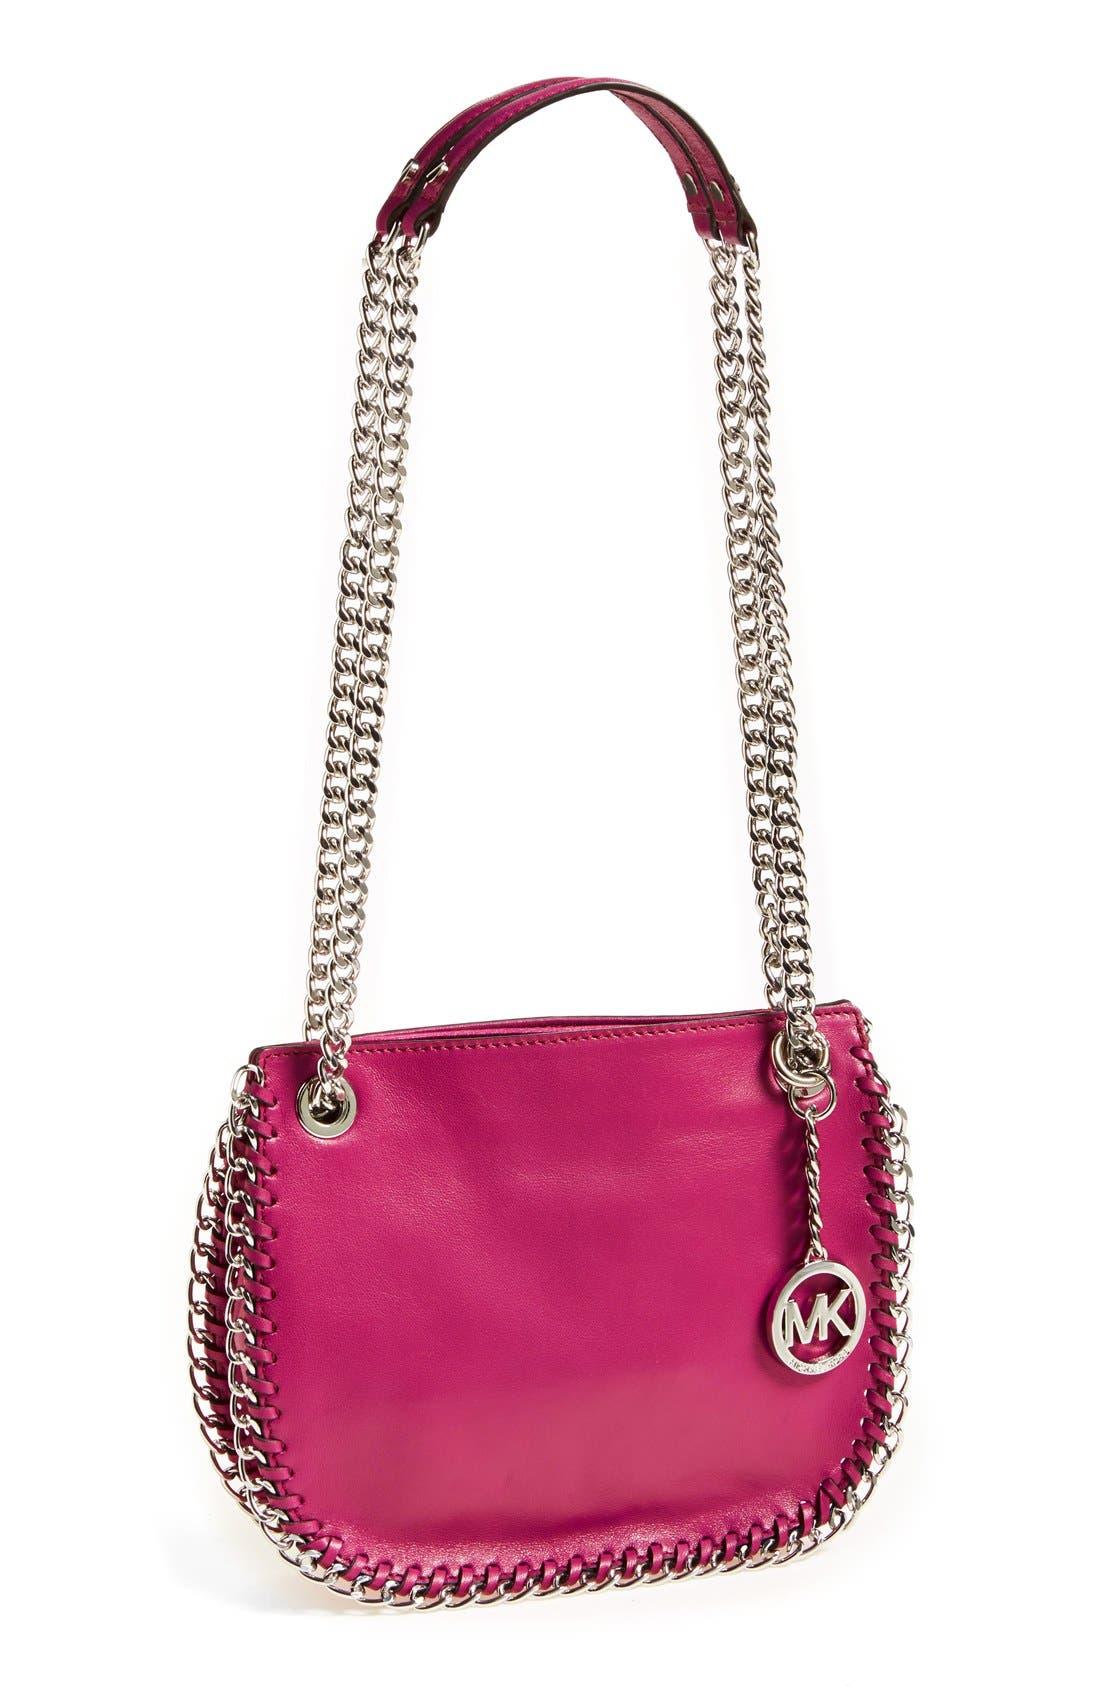 Alternate Image 1 Selected - MICHAEL Michael Kors 'Small Chelsea' Convertible Crossbody Bag